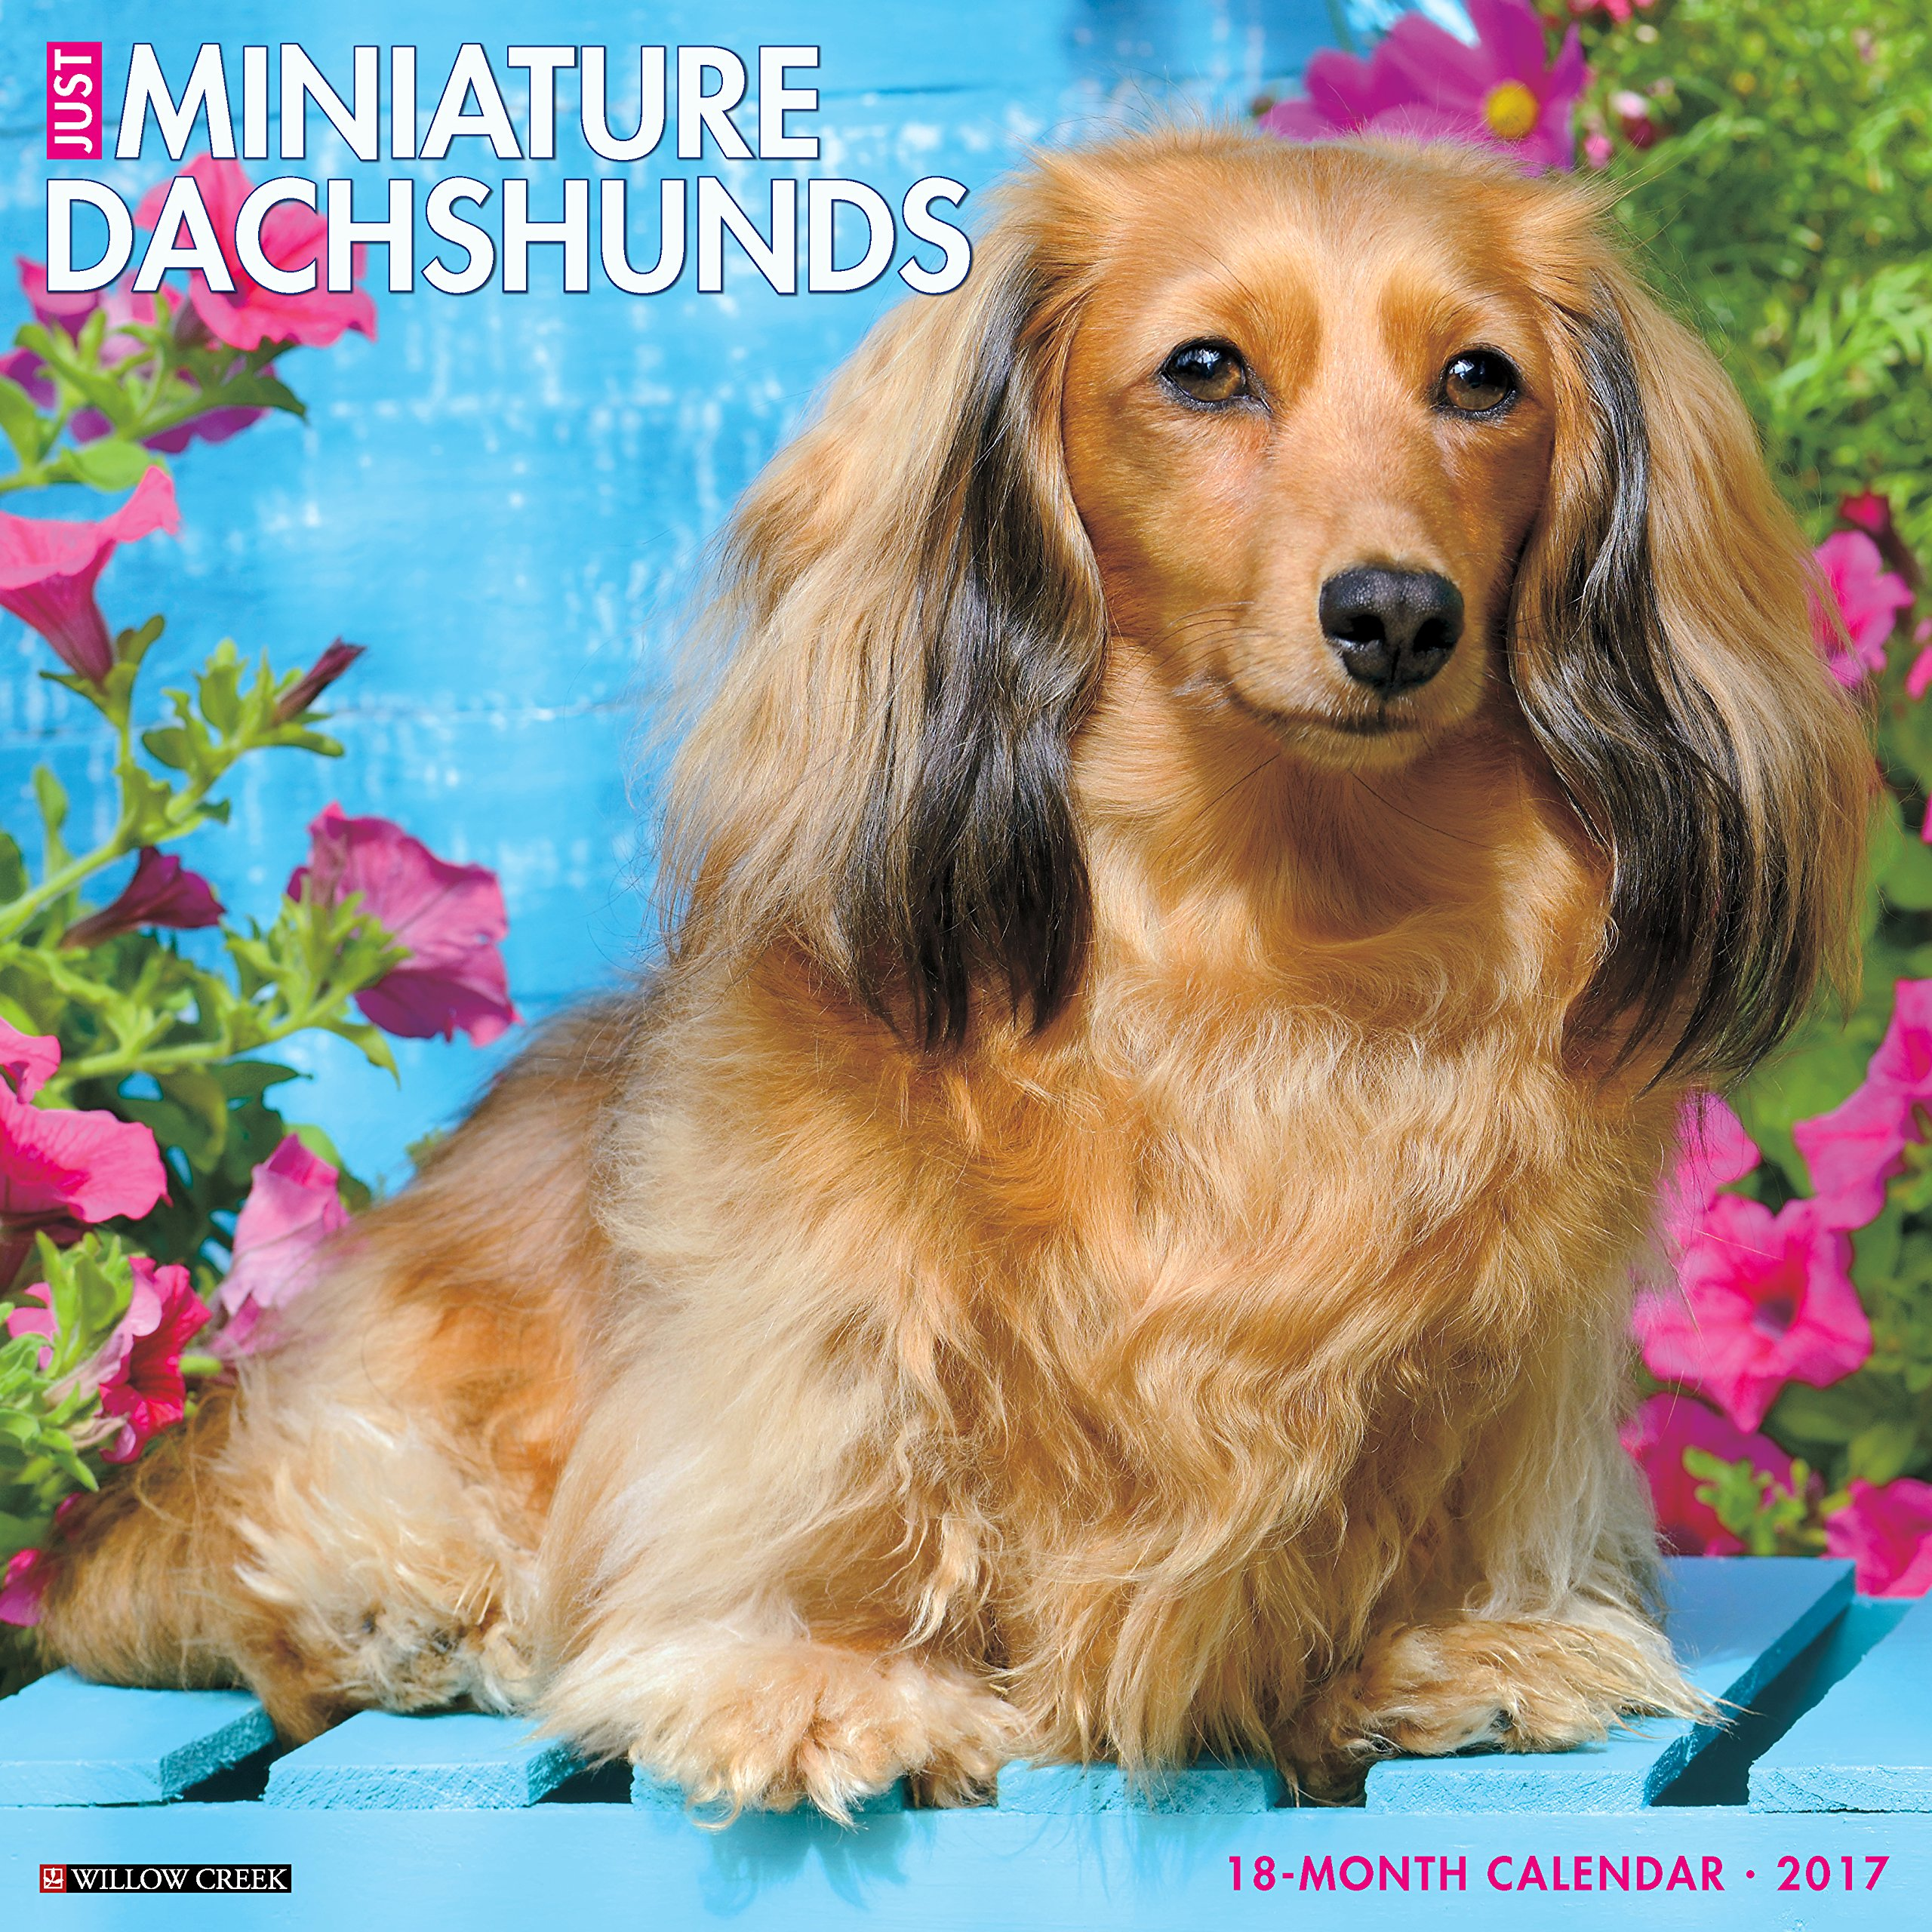 Just Mini Dachshunds 2017 Wall Calendar (Dog Breed Calendars) PDF